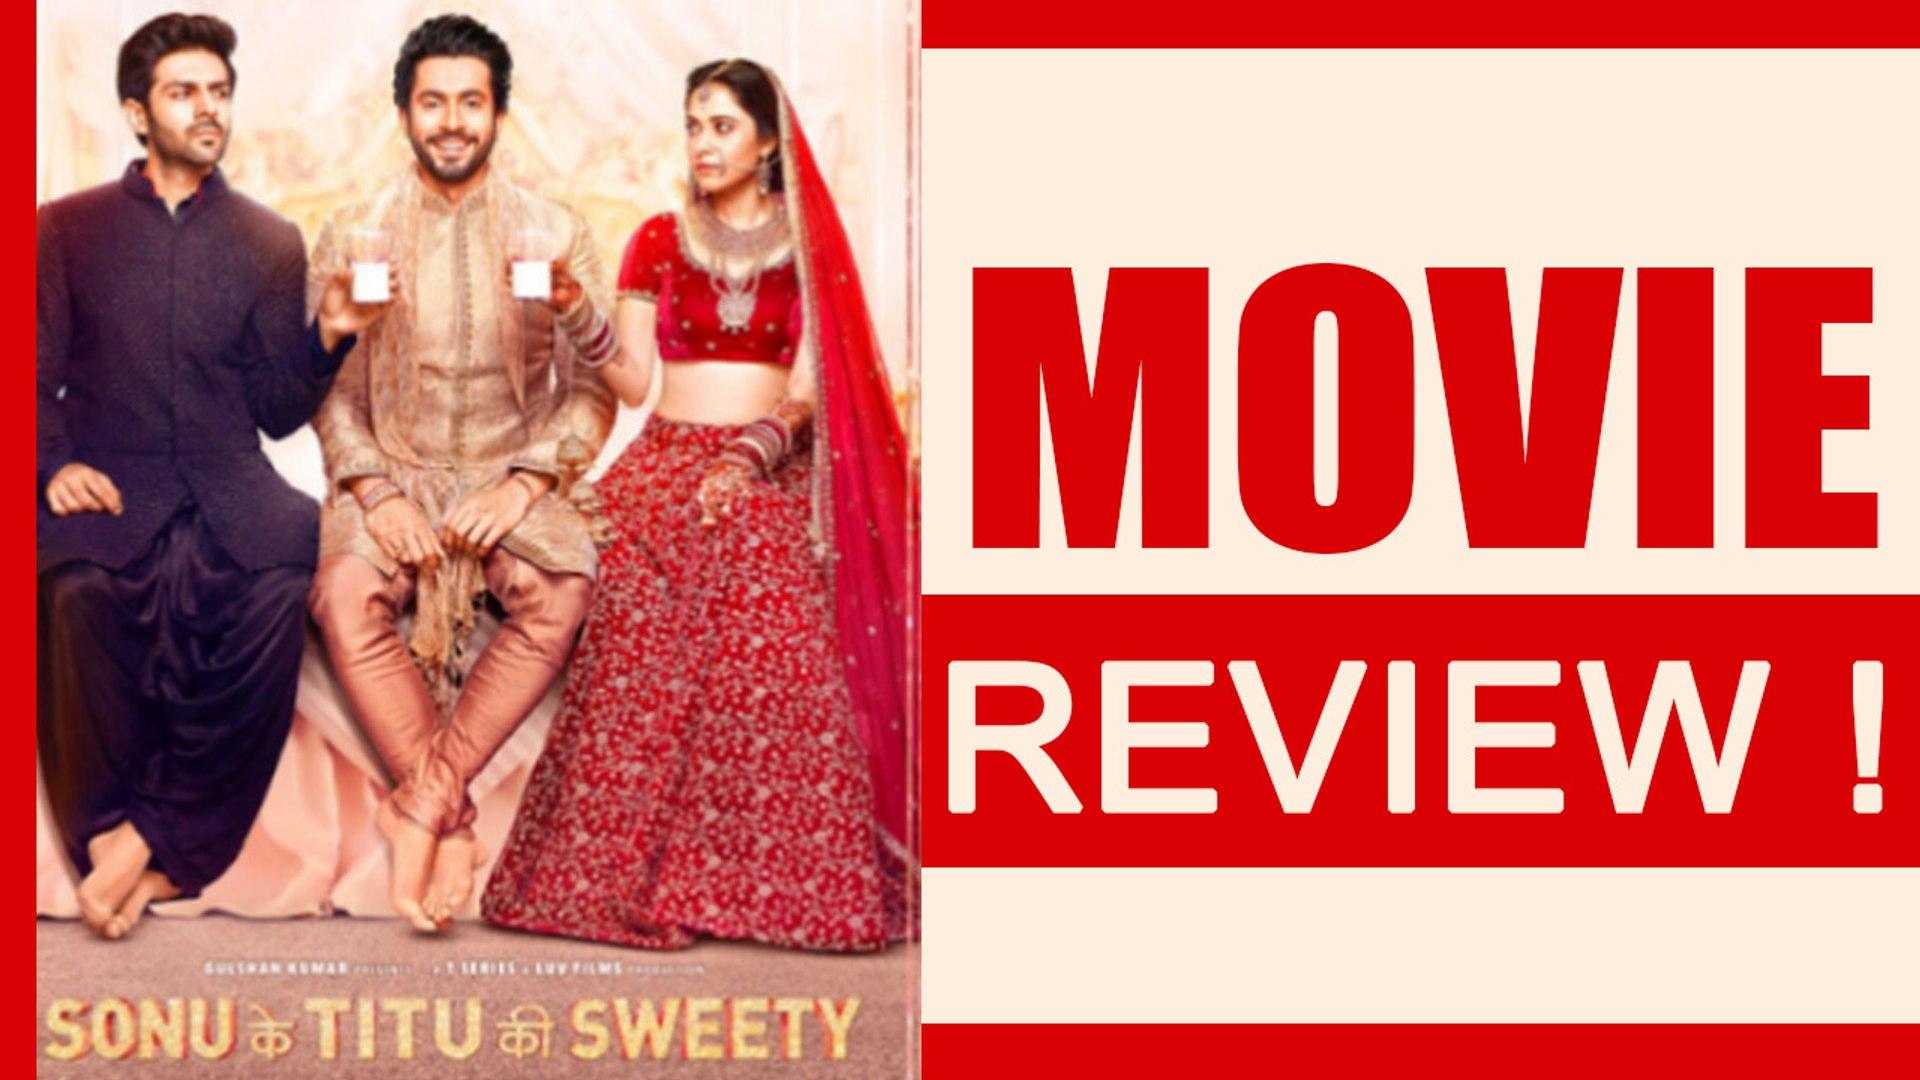 Sonu Ke Titu Ki Sweety Movie Review Kartik Aryan Sunny Singh Nushrat Bharucha Filmibeat